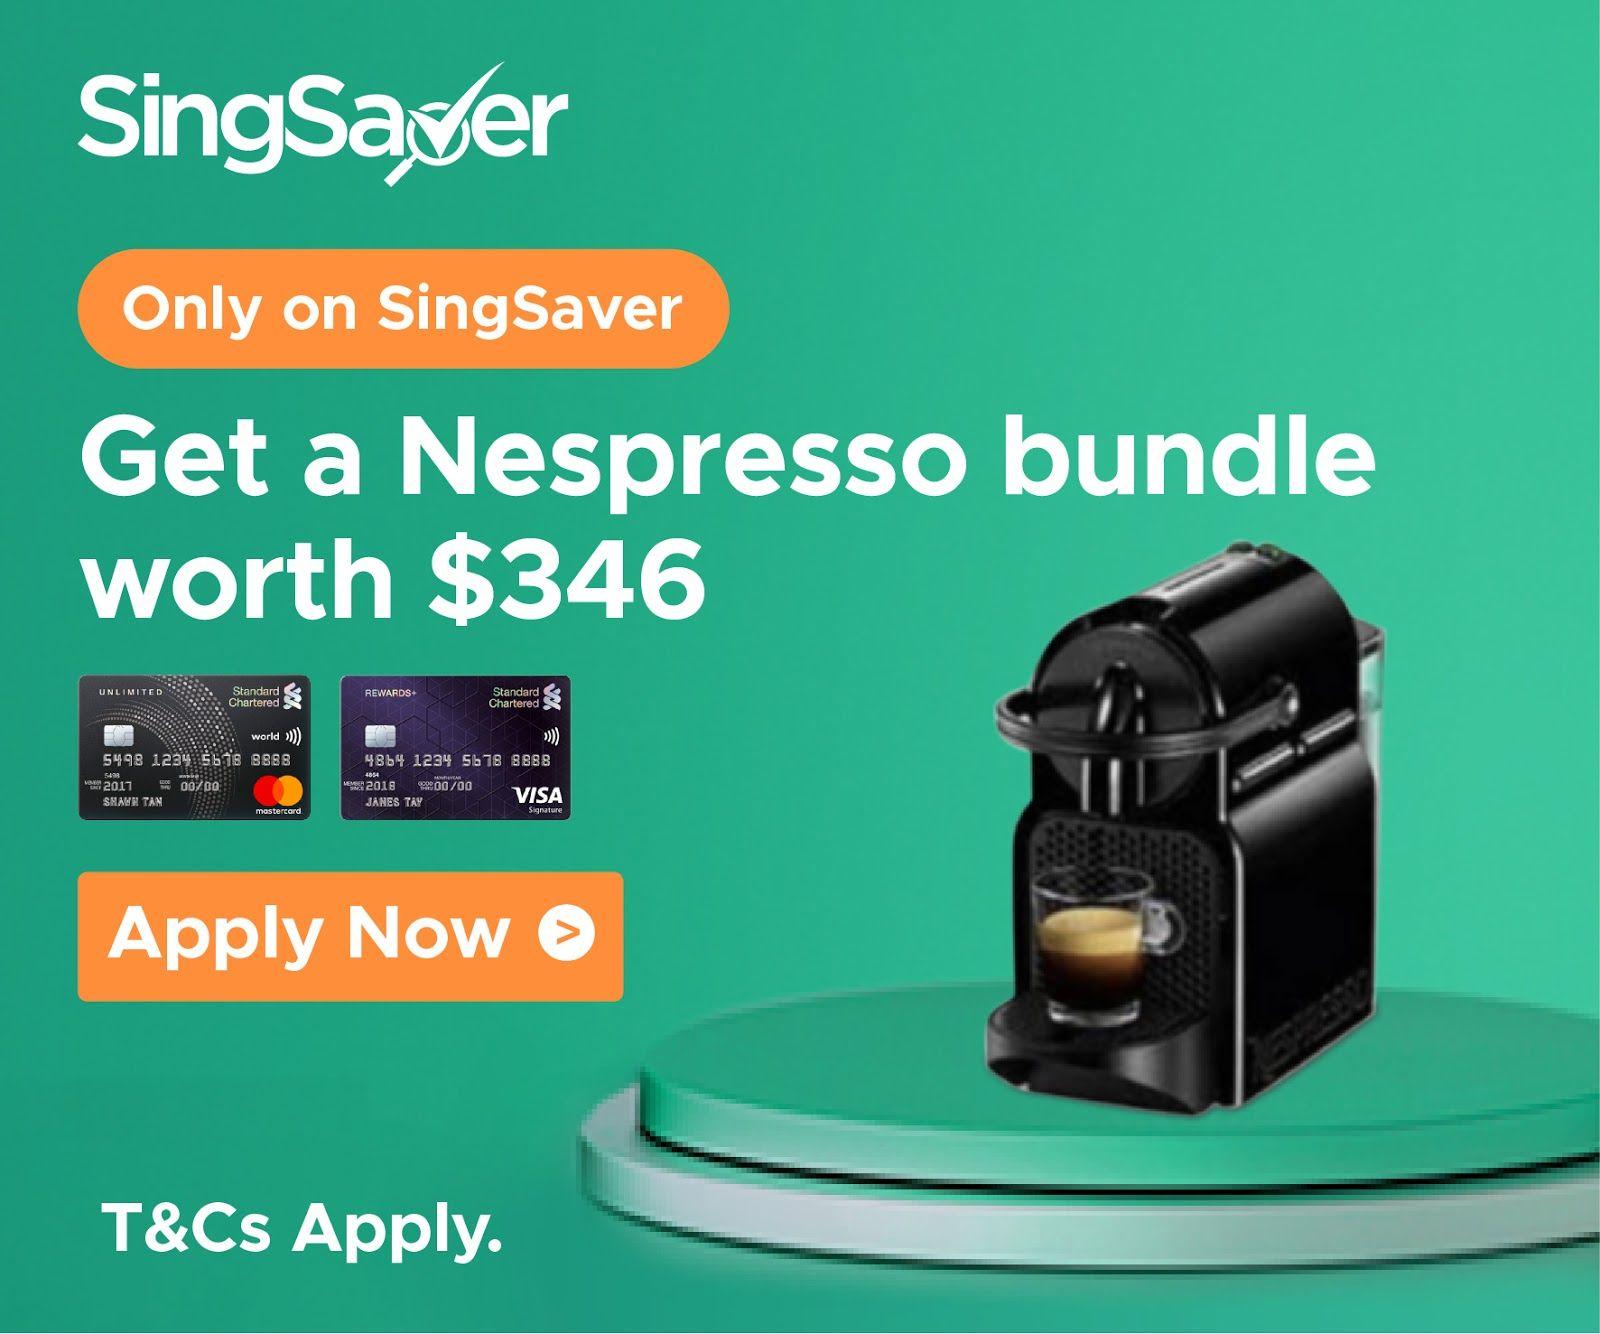 Singsaver (SG) SingSaver SCB Nespresso 2020 in 2020